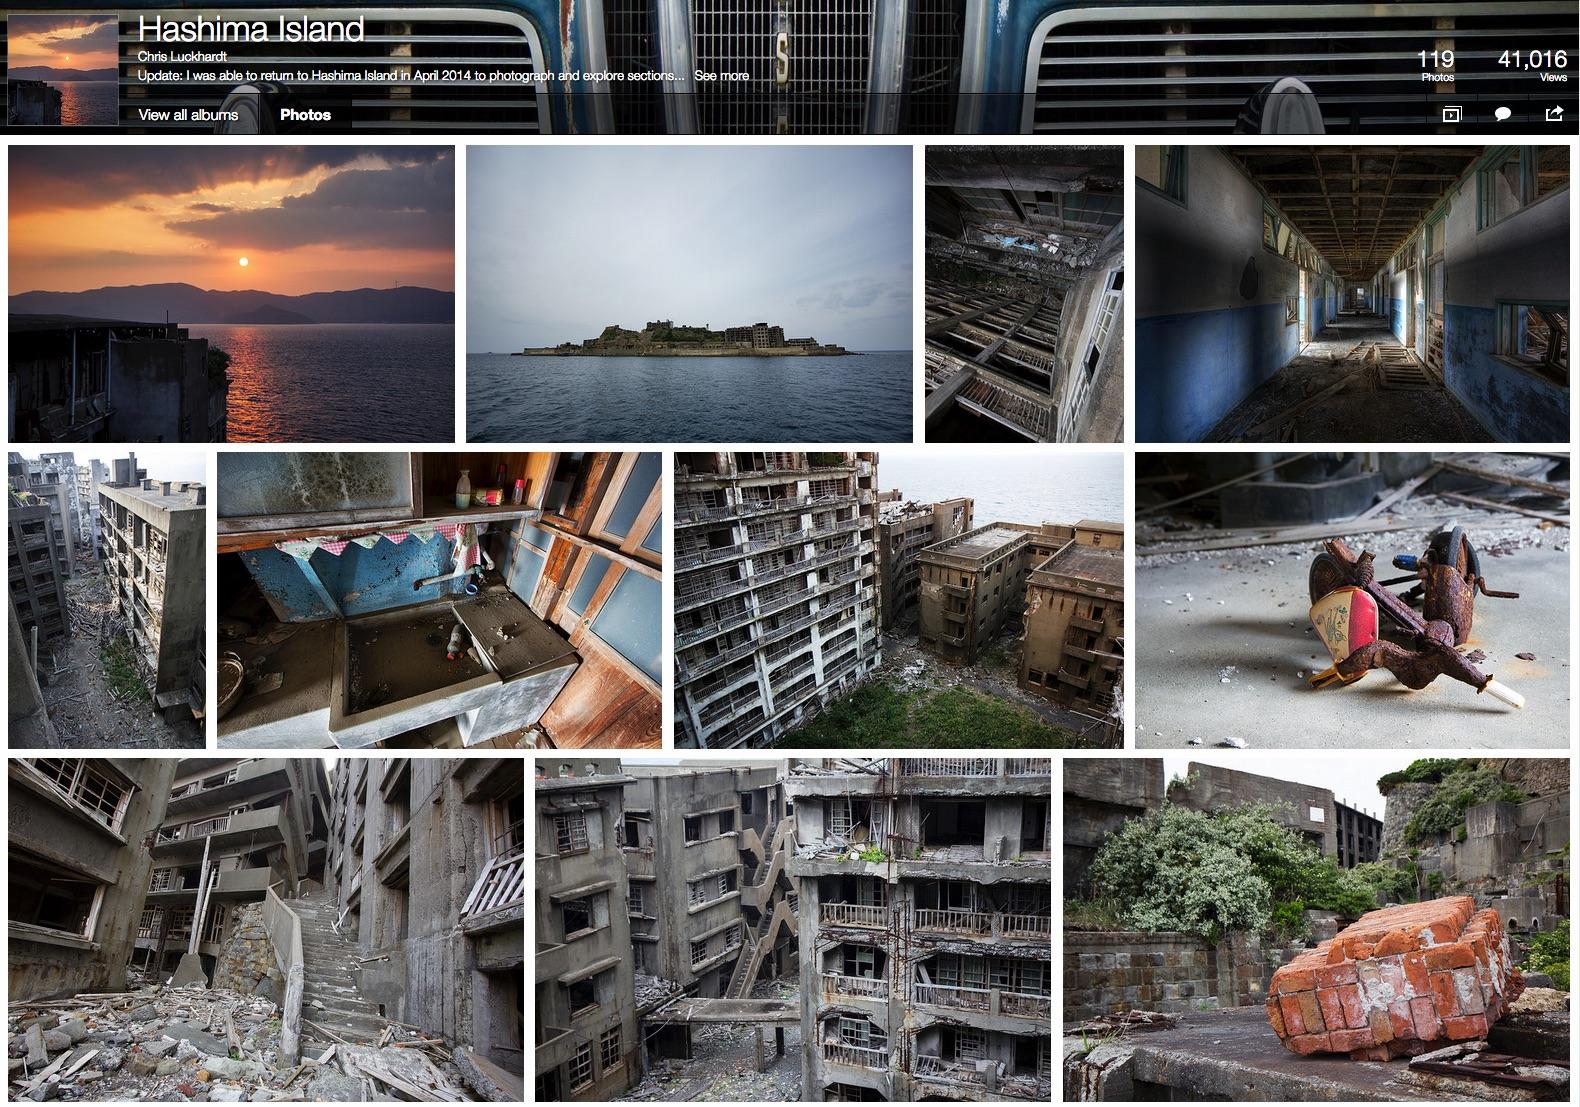 Click to see Chris Luckhardt's Hashima Island photos